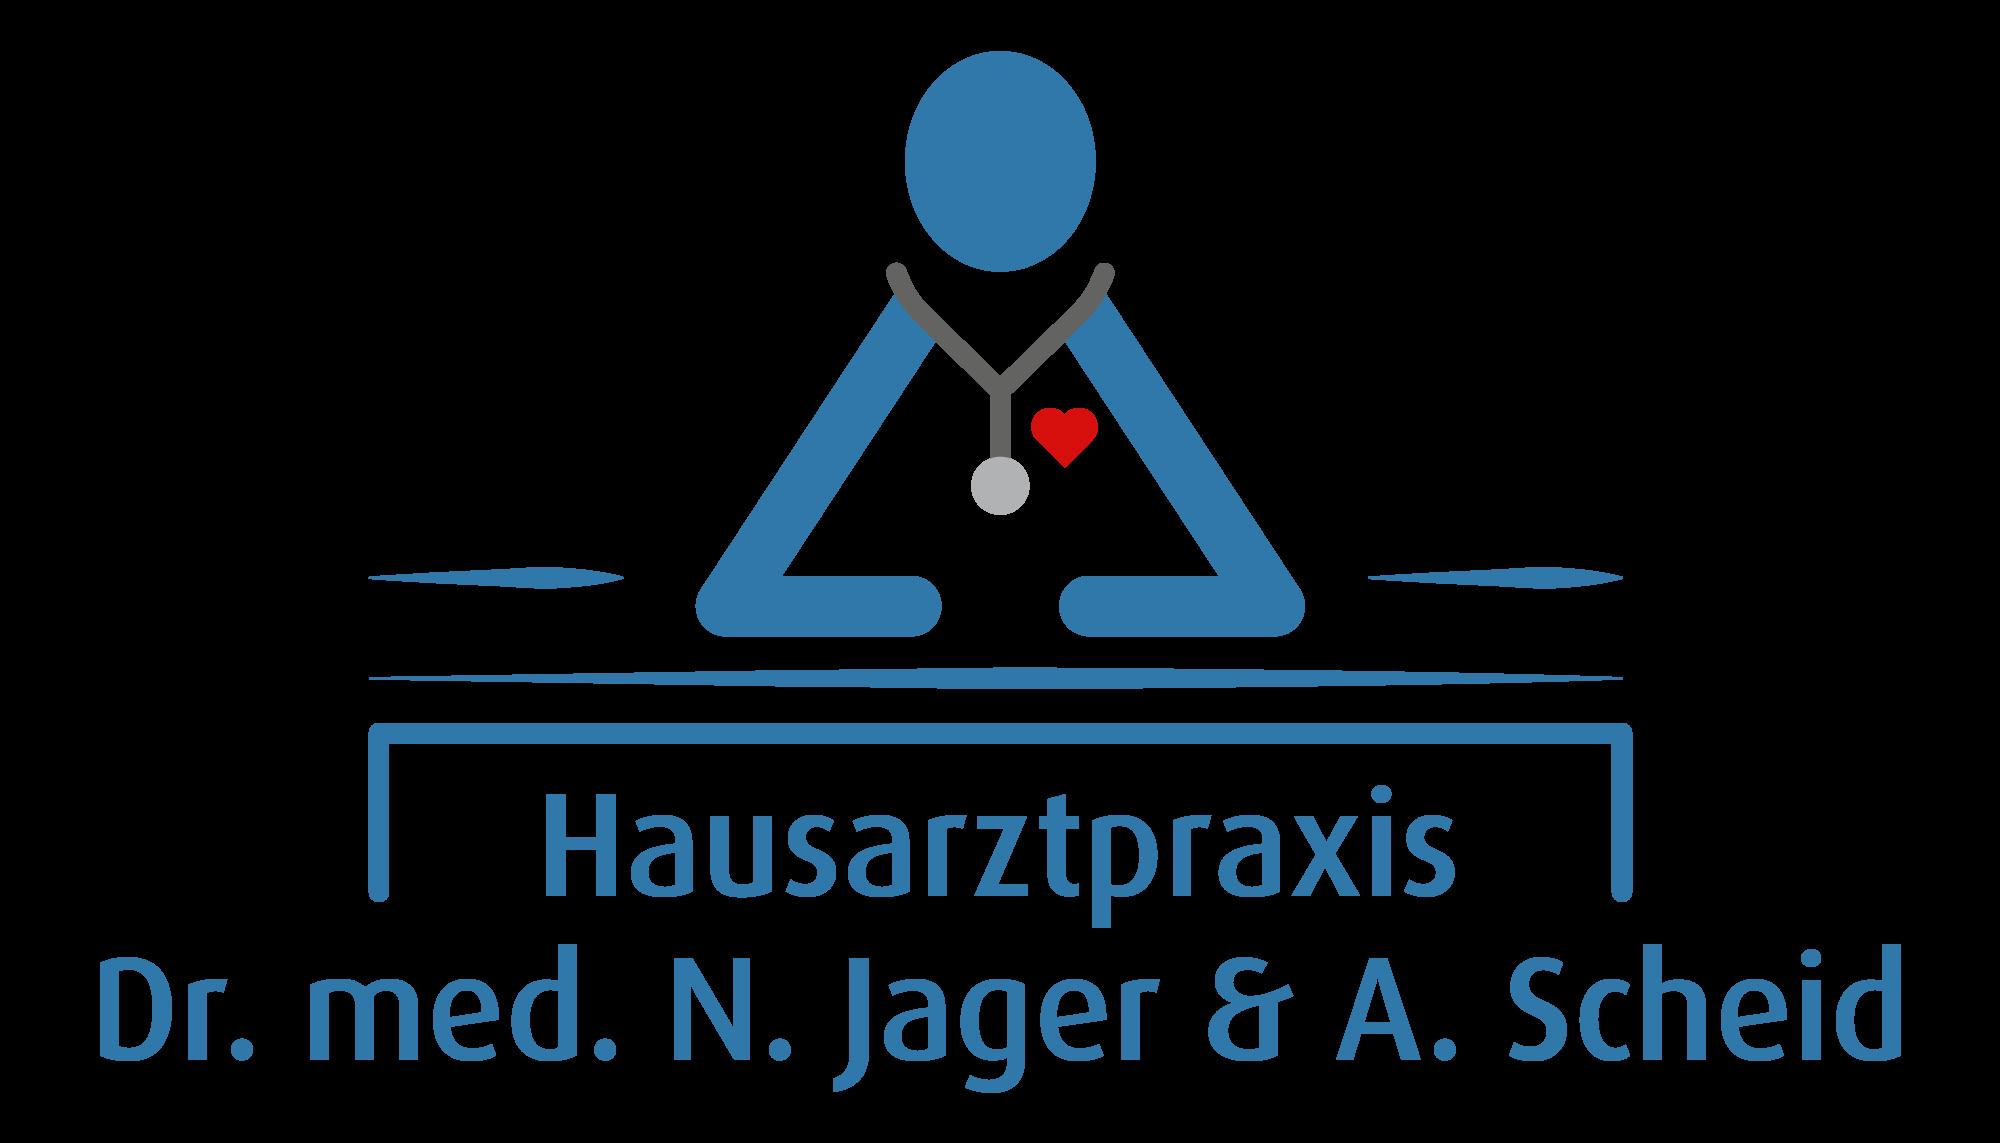 Hausarzt Aachen Dr. Jager - Scheid